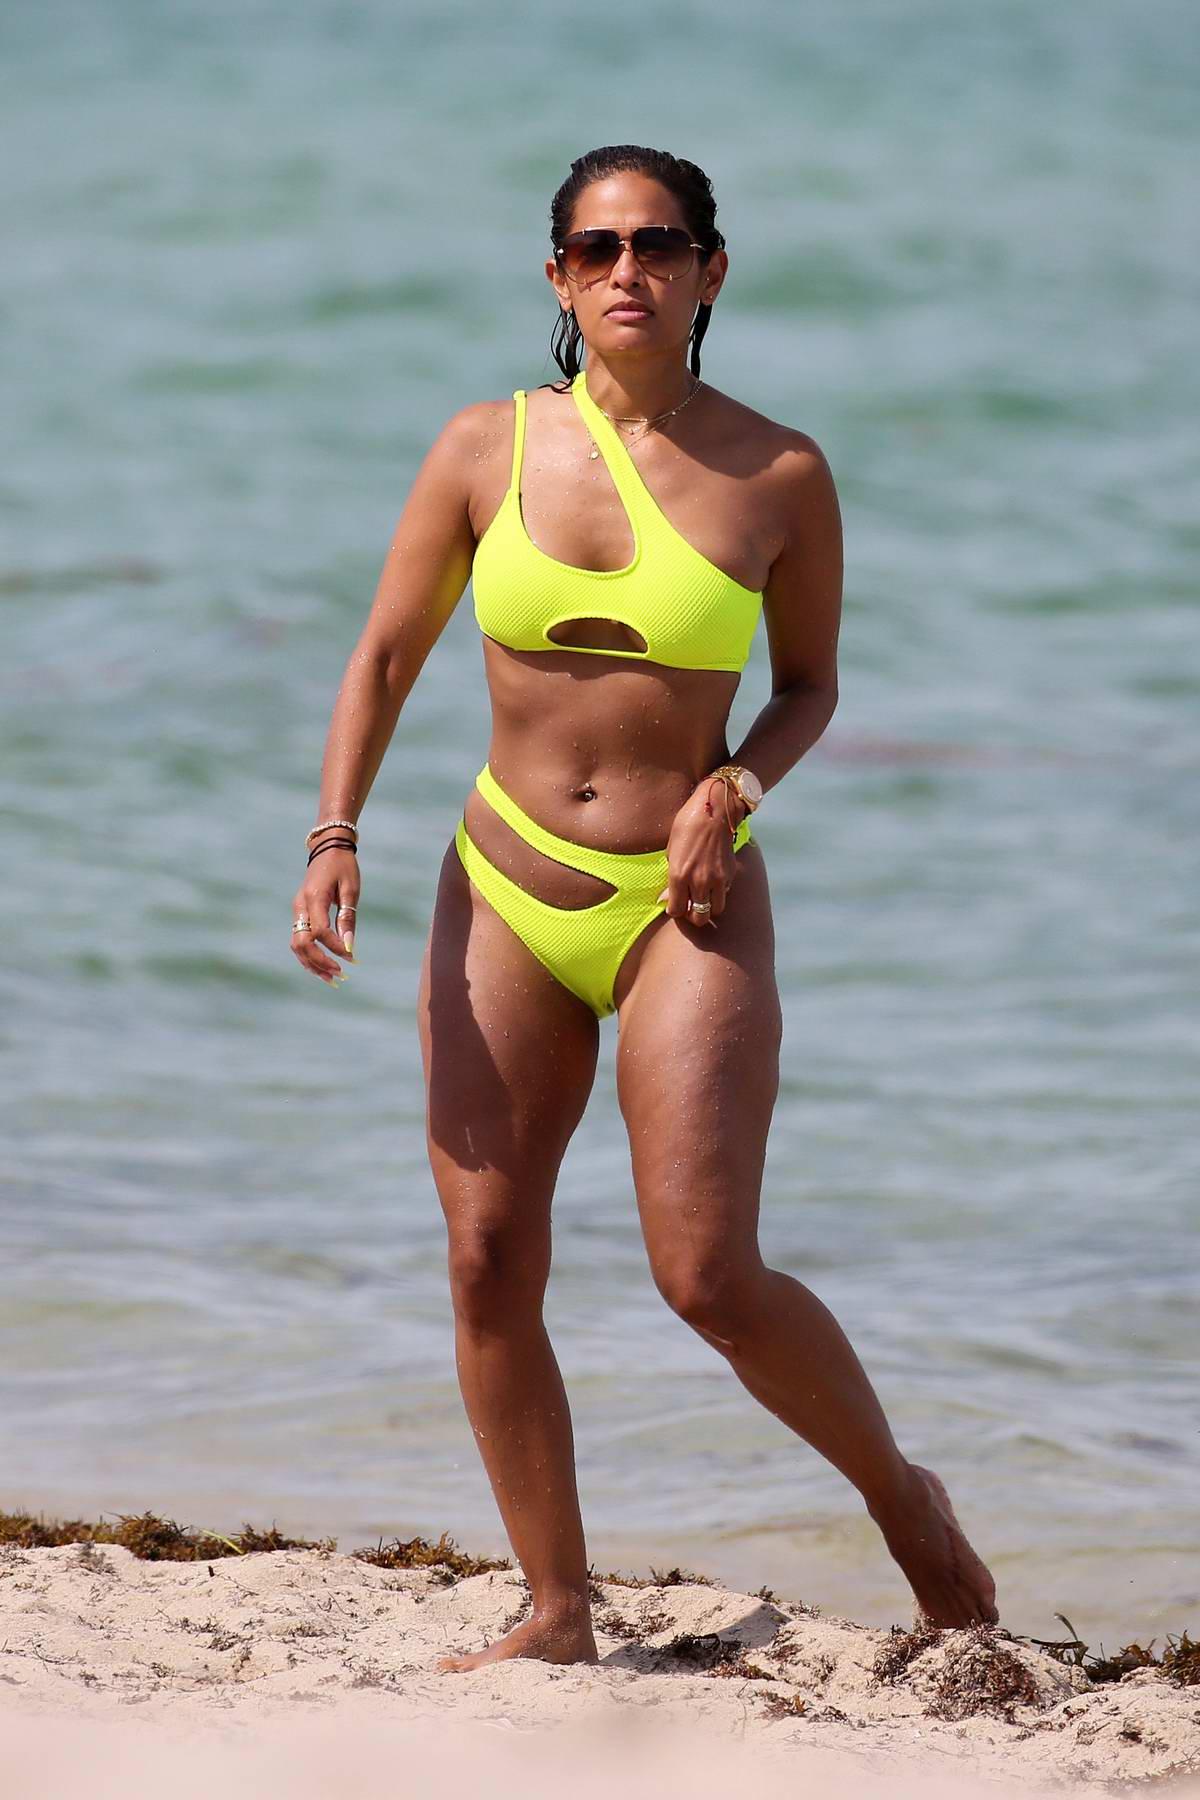 Rocsi Diaz stuns in a neon green bikini as she enjoys a day at the beach in Miami, Florida